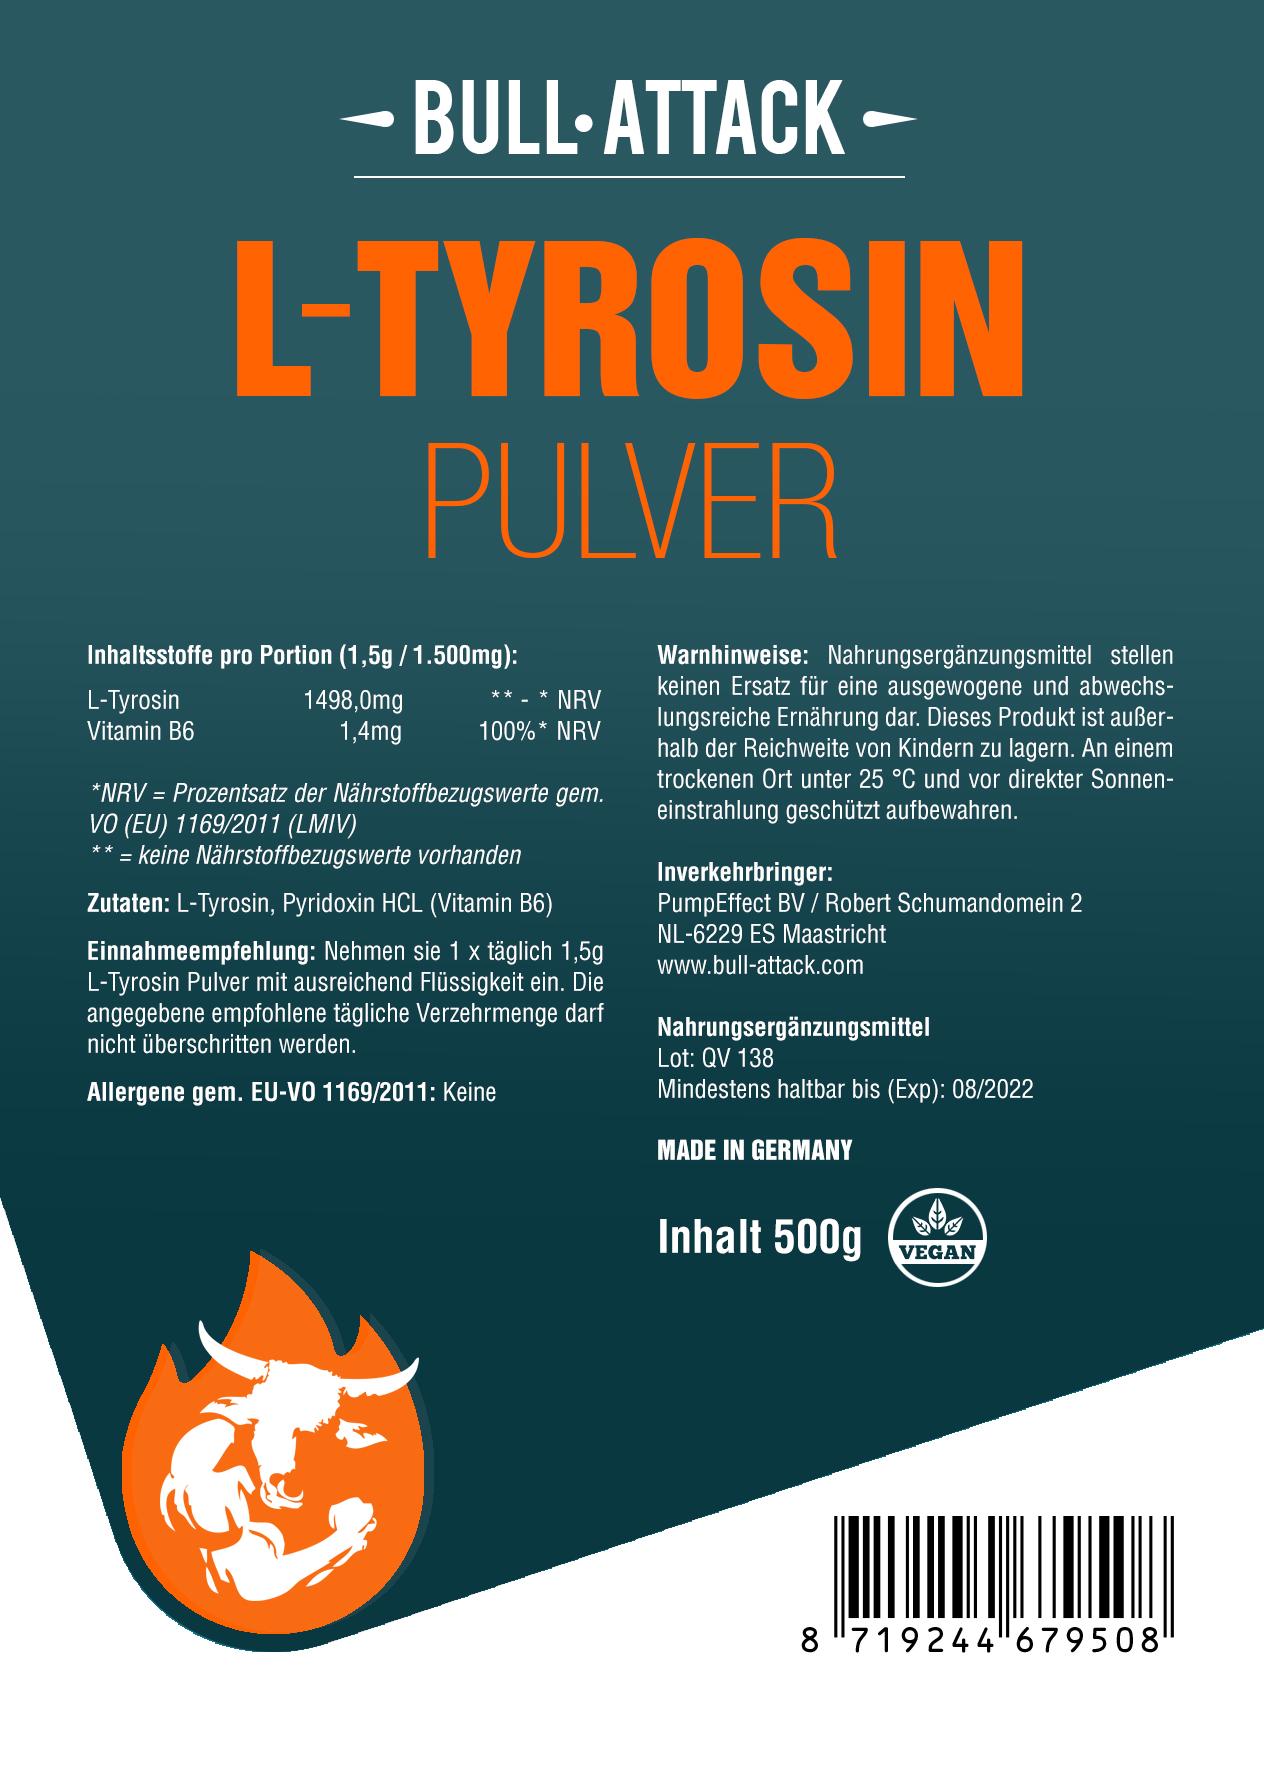 L-Tyrosin Pulver - hochwertiges Tyrosin Pulver + Vitamin B6